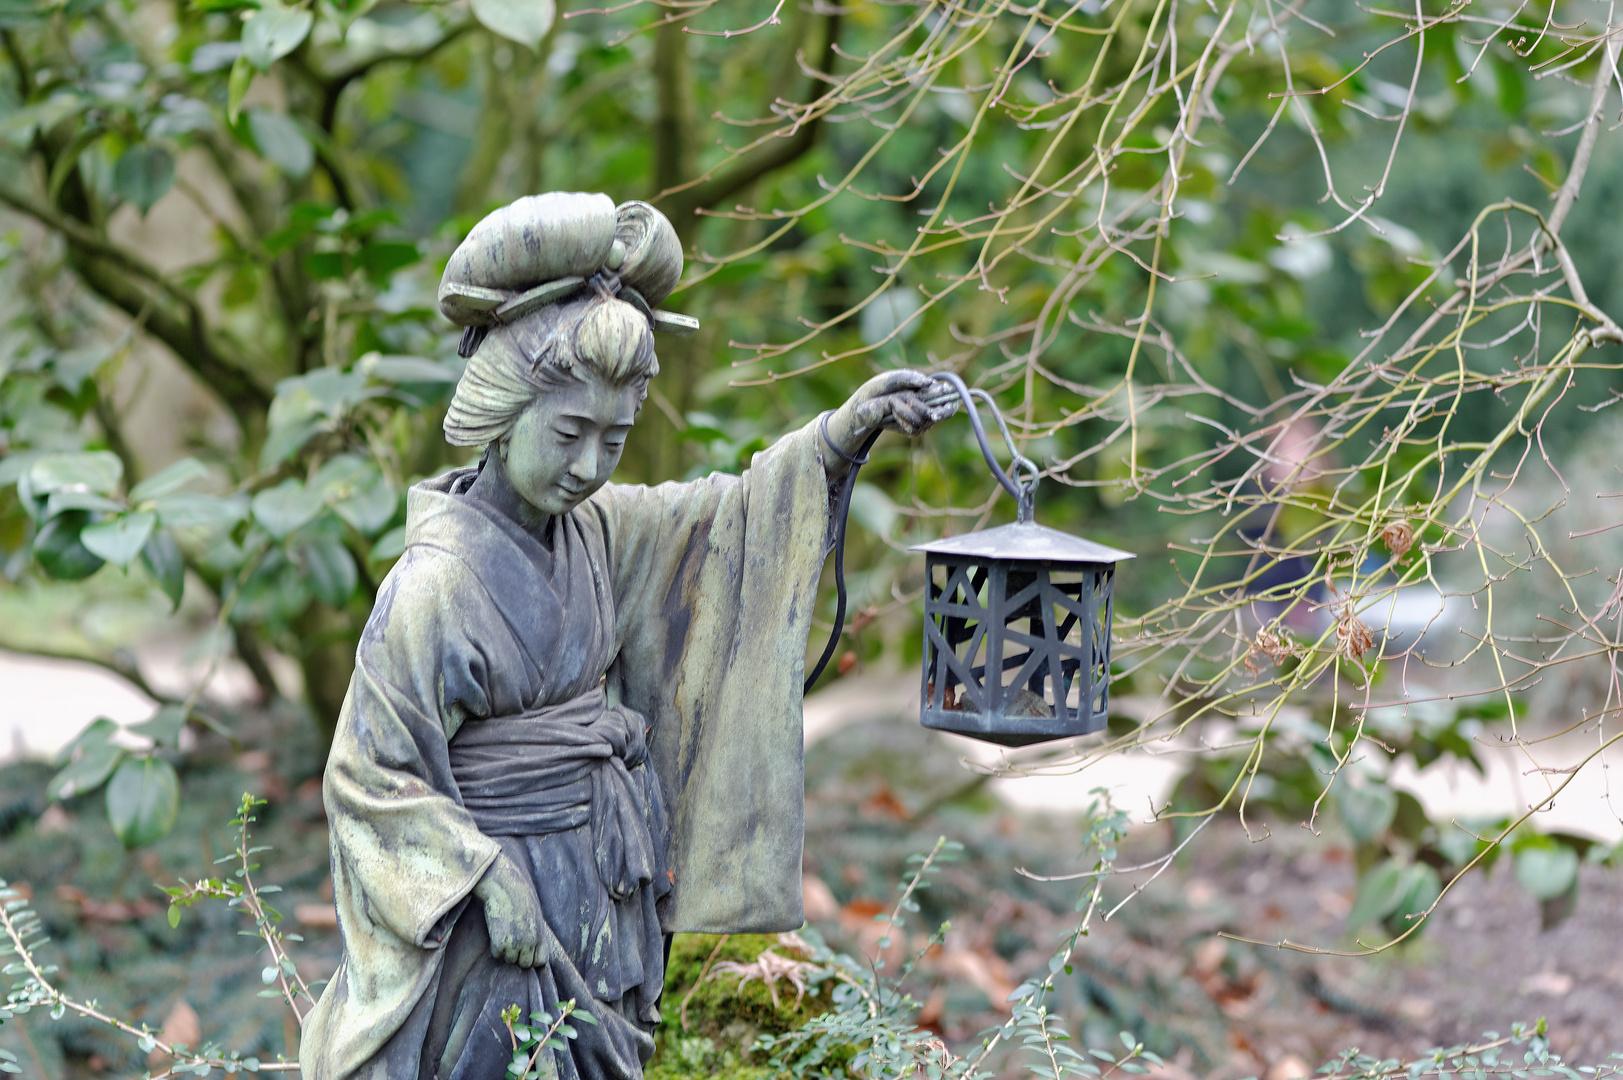 Japanischer Garten Leverkusen 2